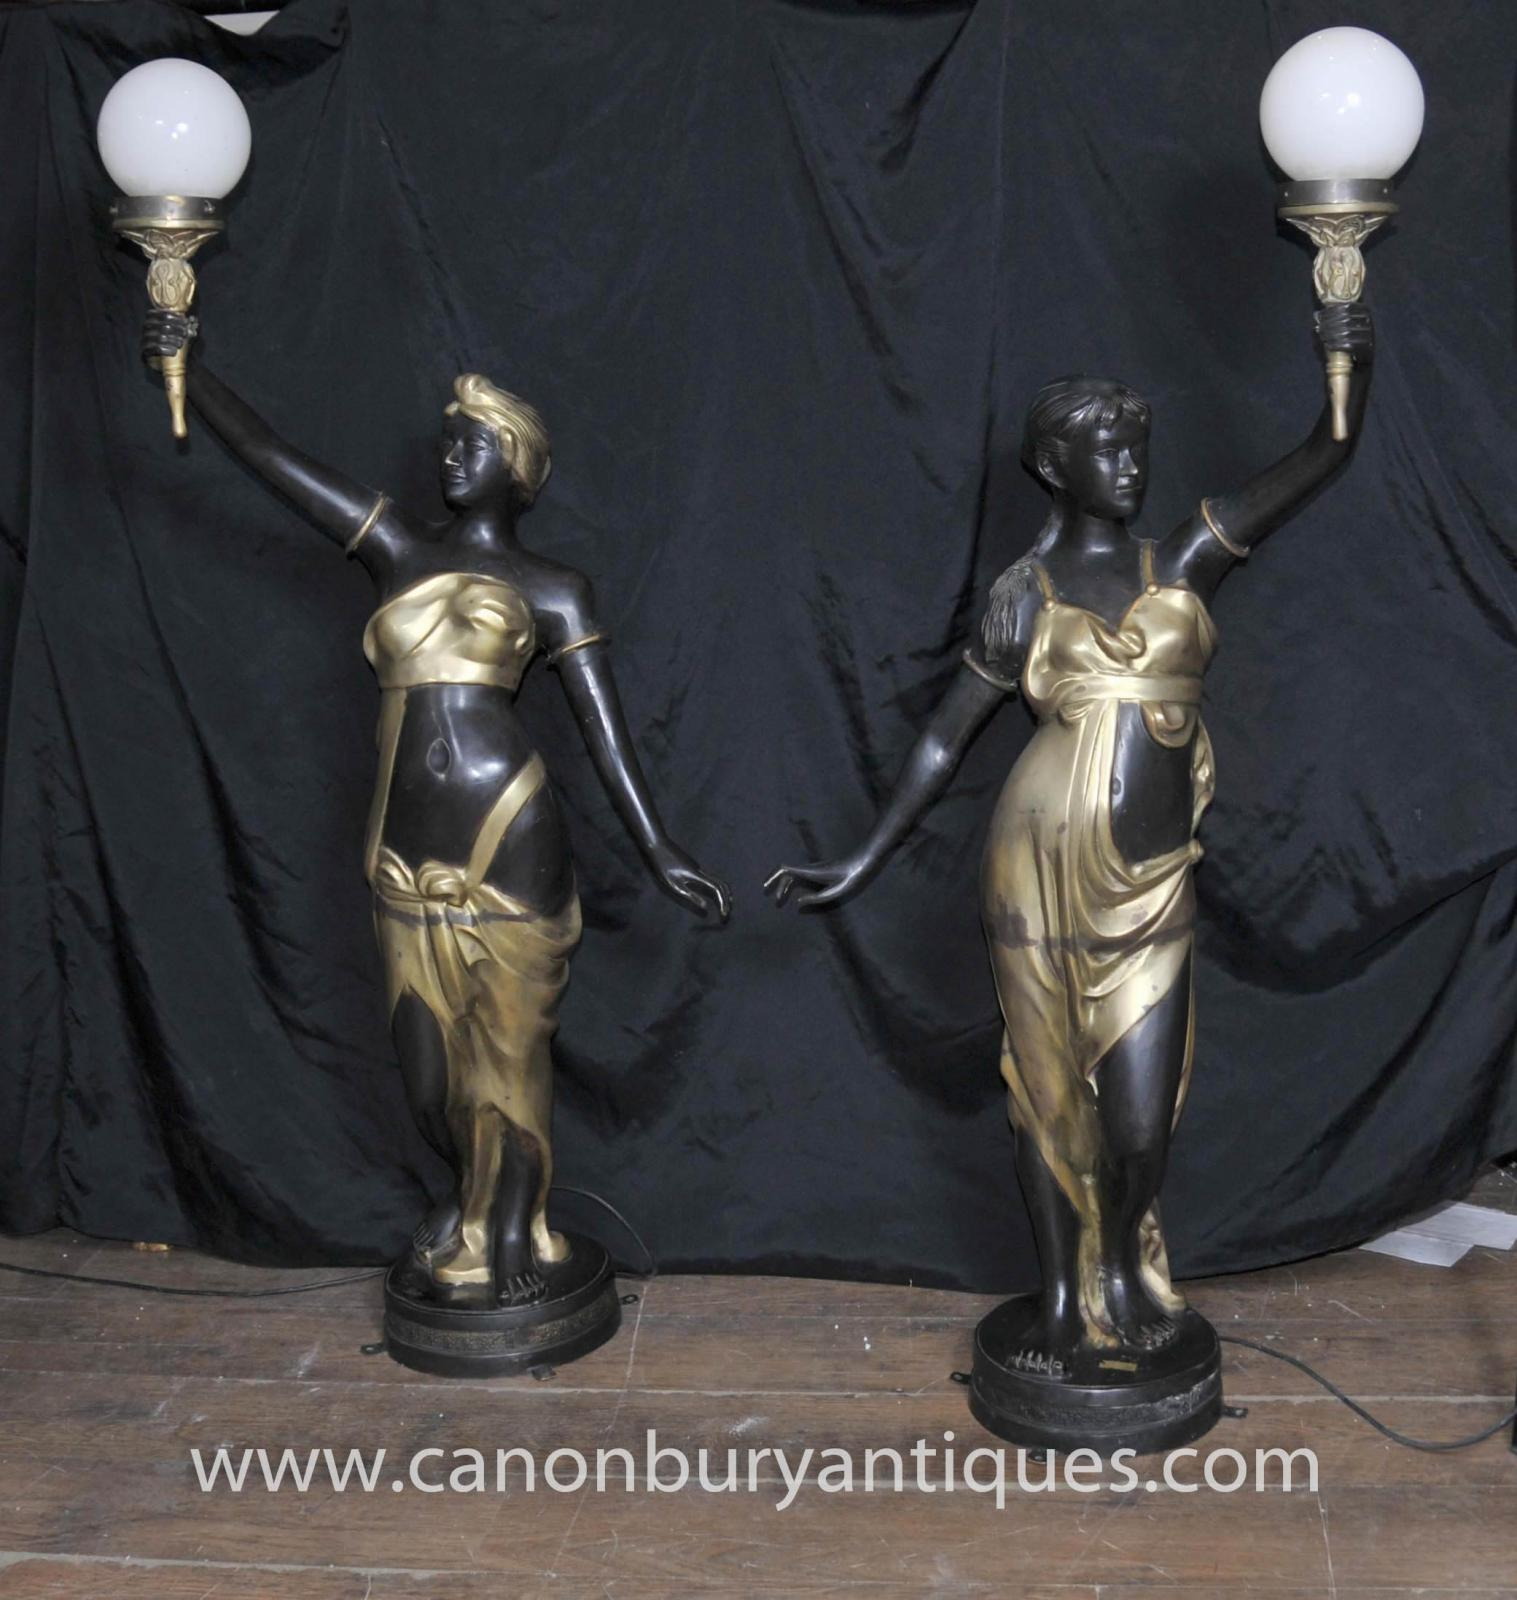 pair french art nouveau bronze female figurine lamps candelabras torcheres ebay. Black Bedroom Furniture Sets. Home Design Ideas